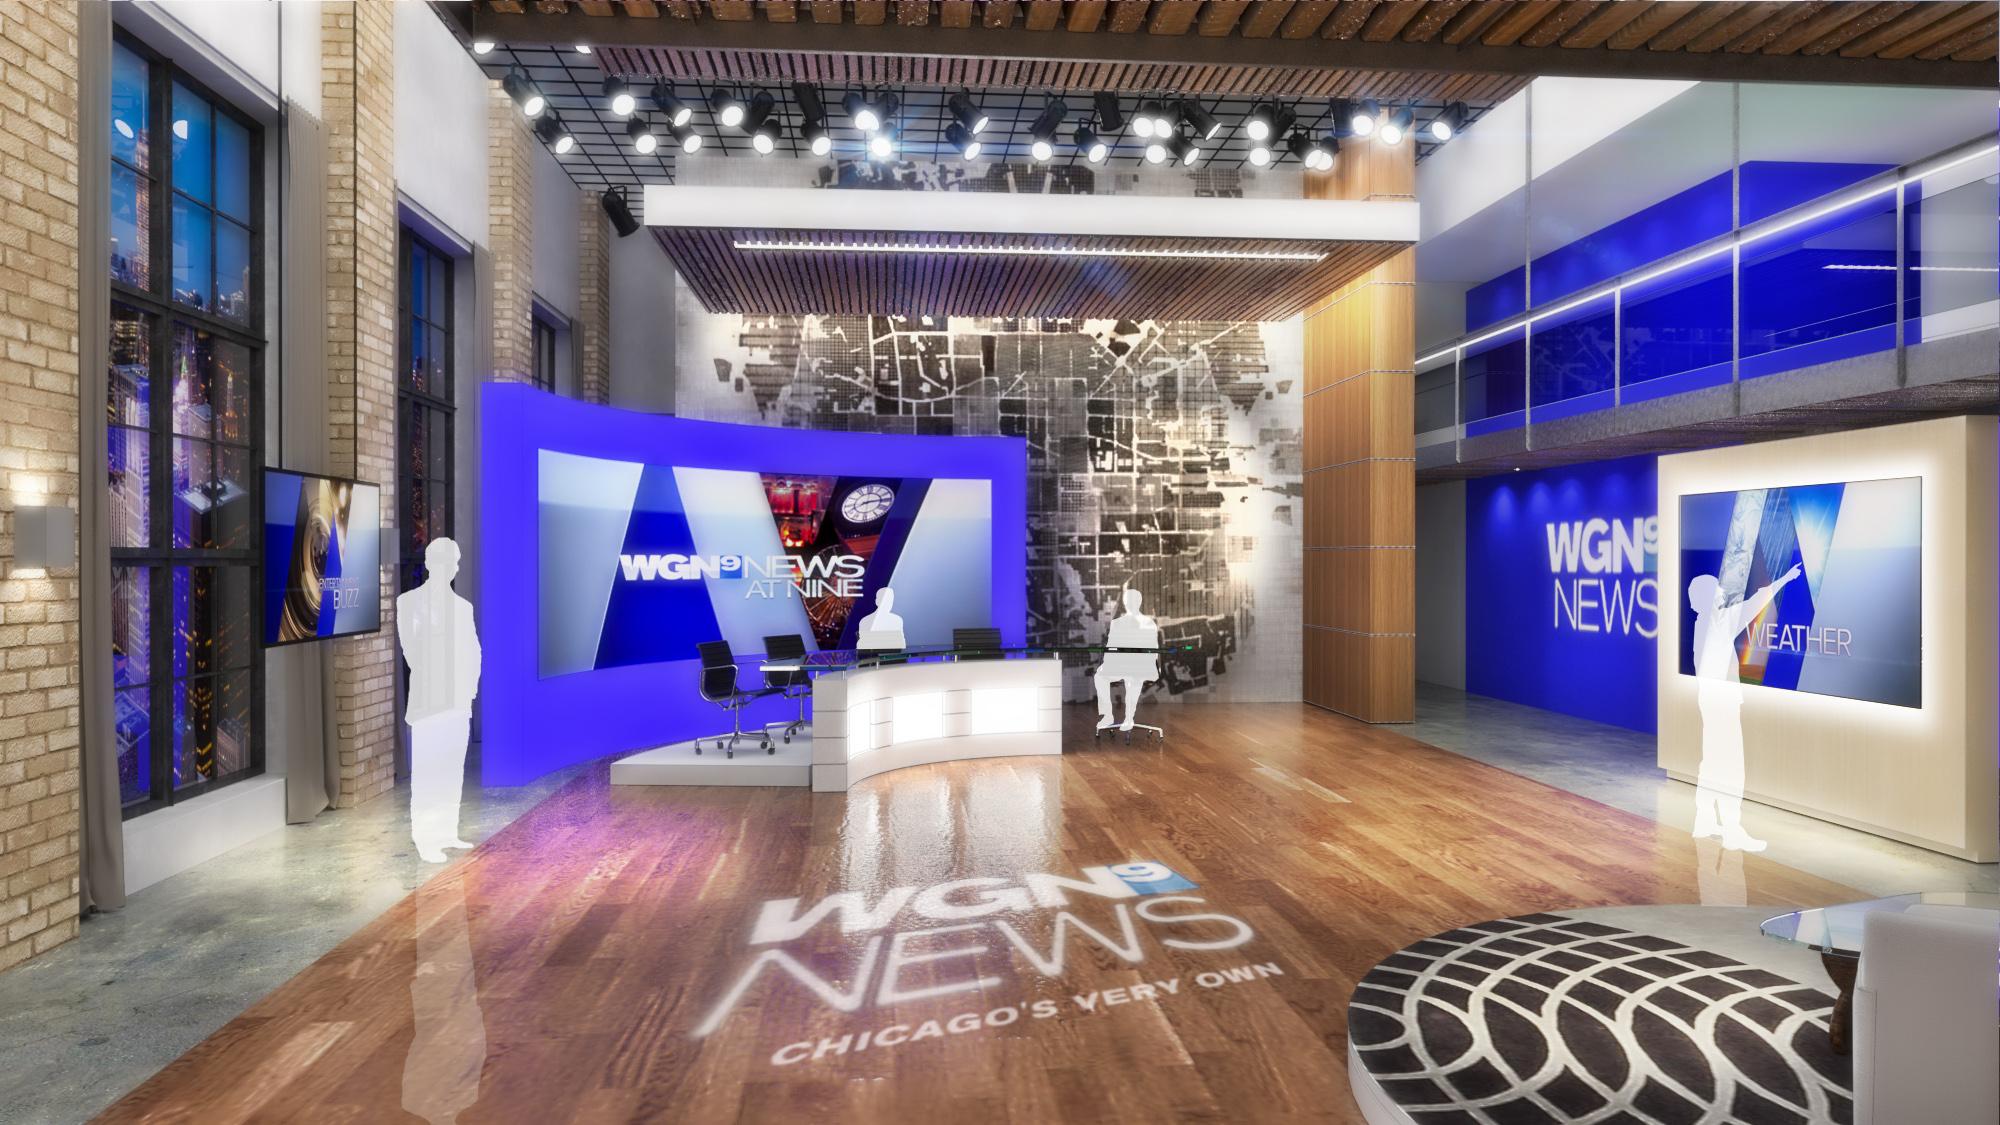 WGN-TV 9 NEWS